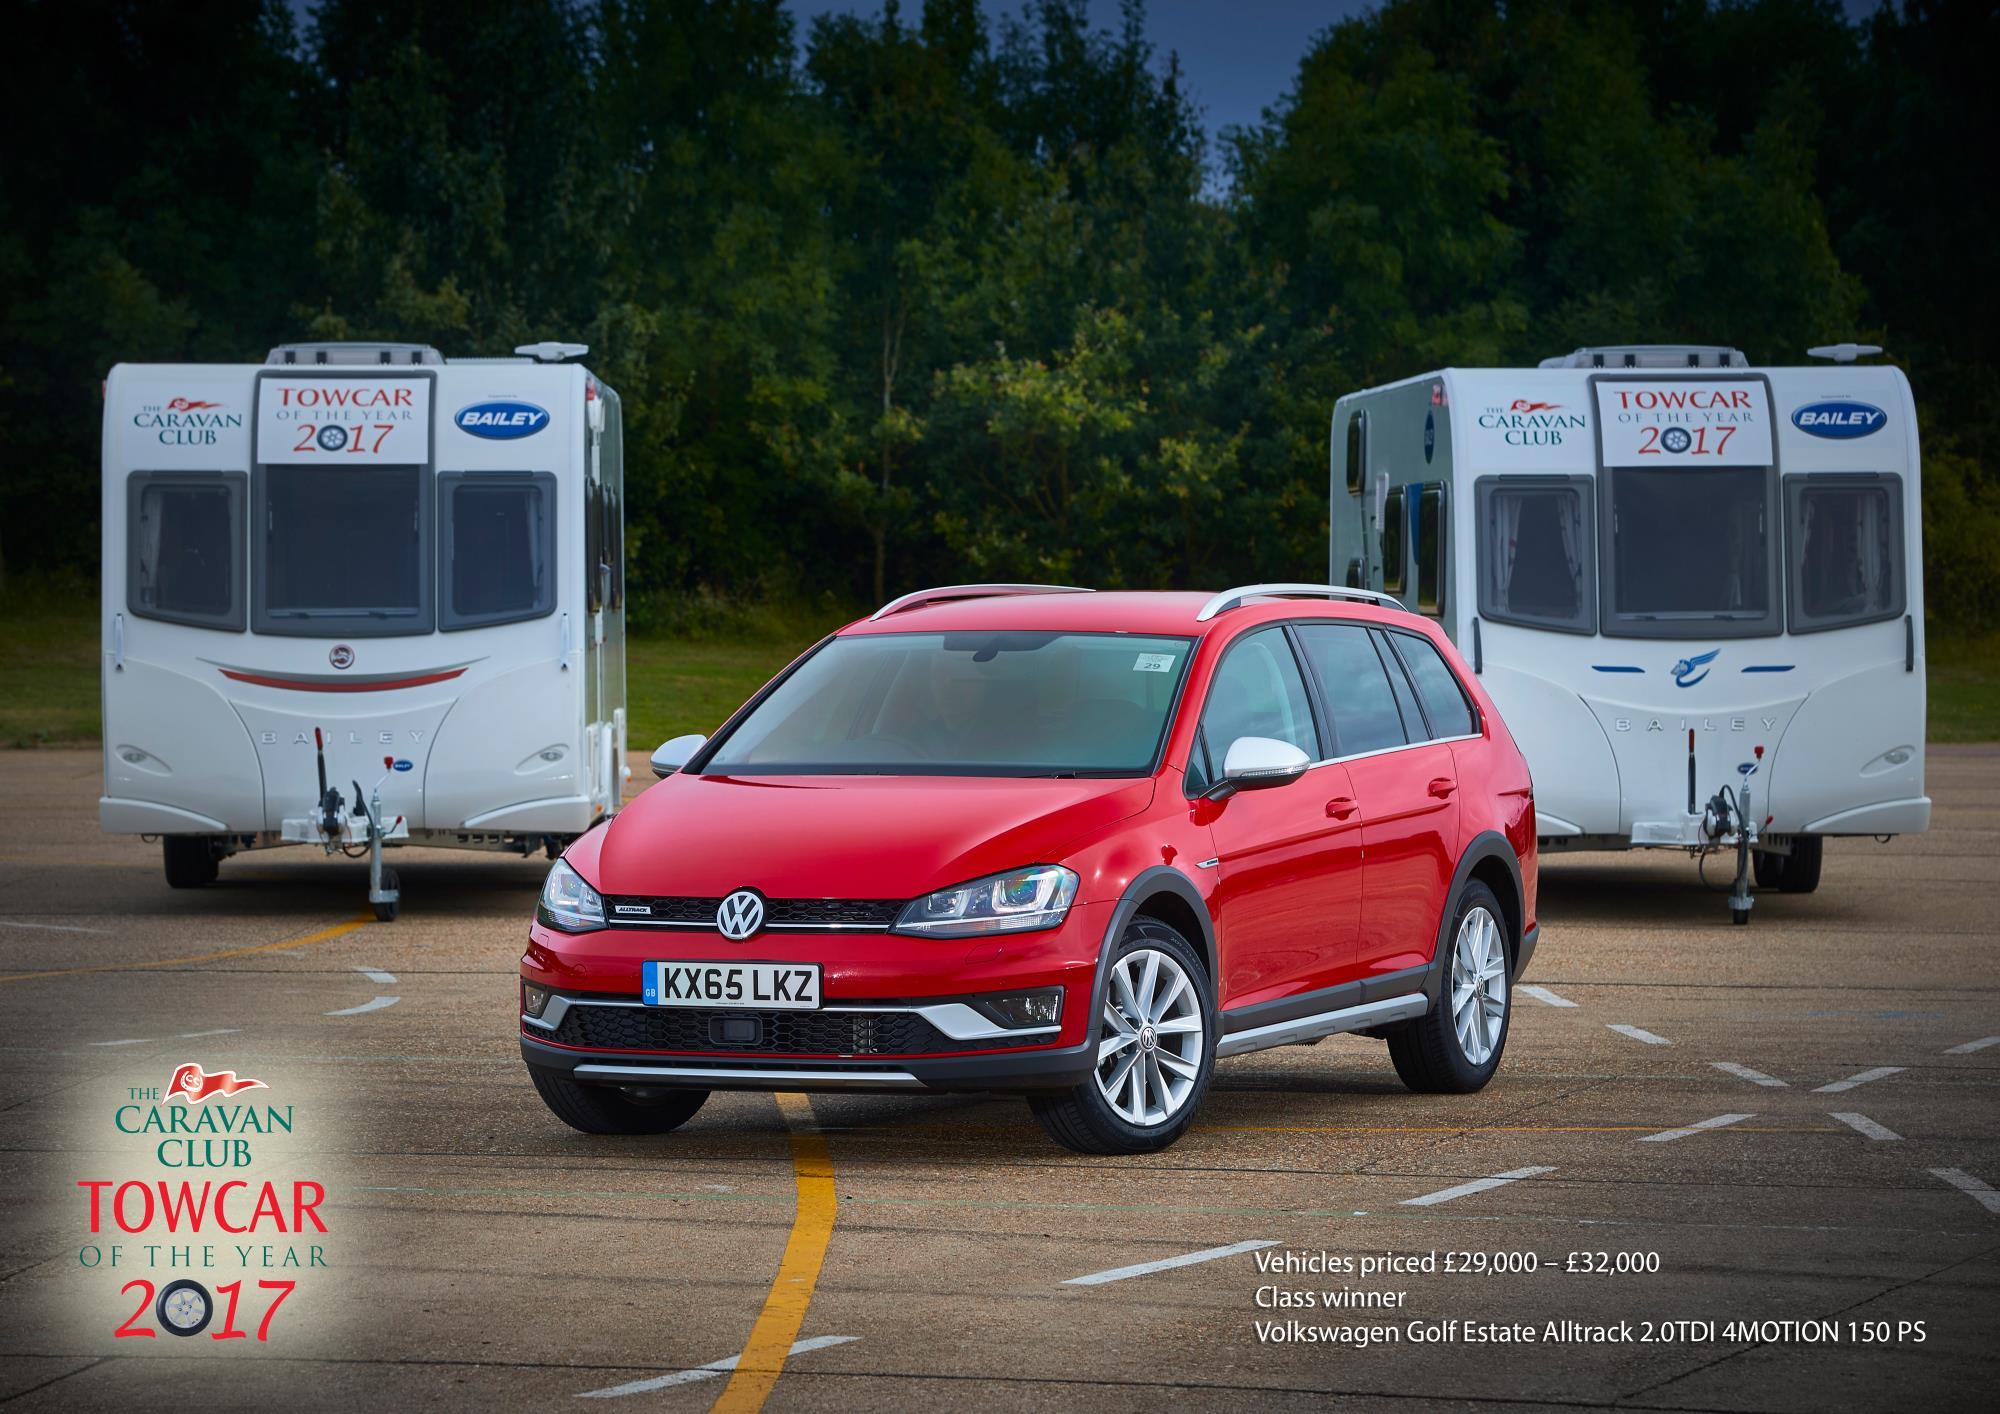 Volkswagen Golf Estate Alltrack 2.0TDI 4MOTION 150 PS